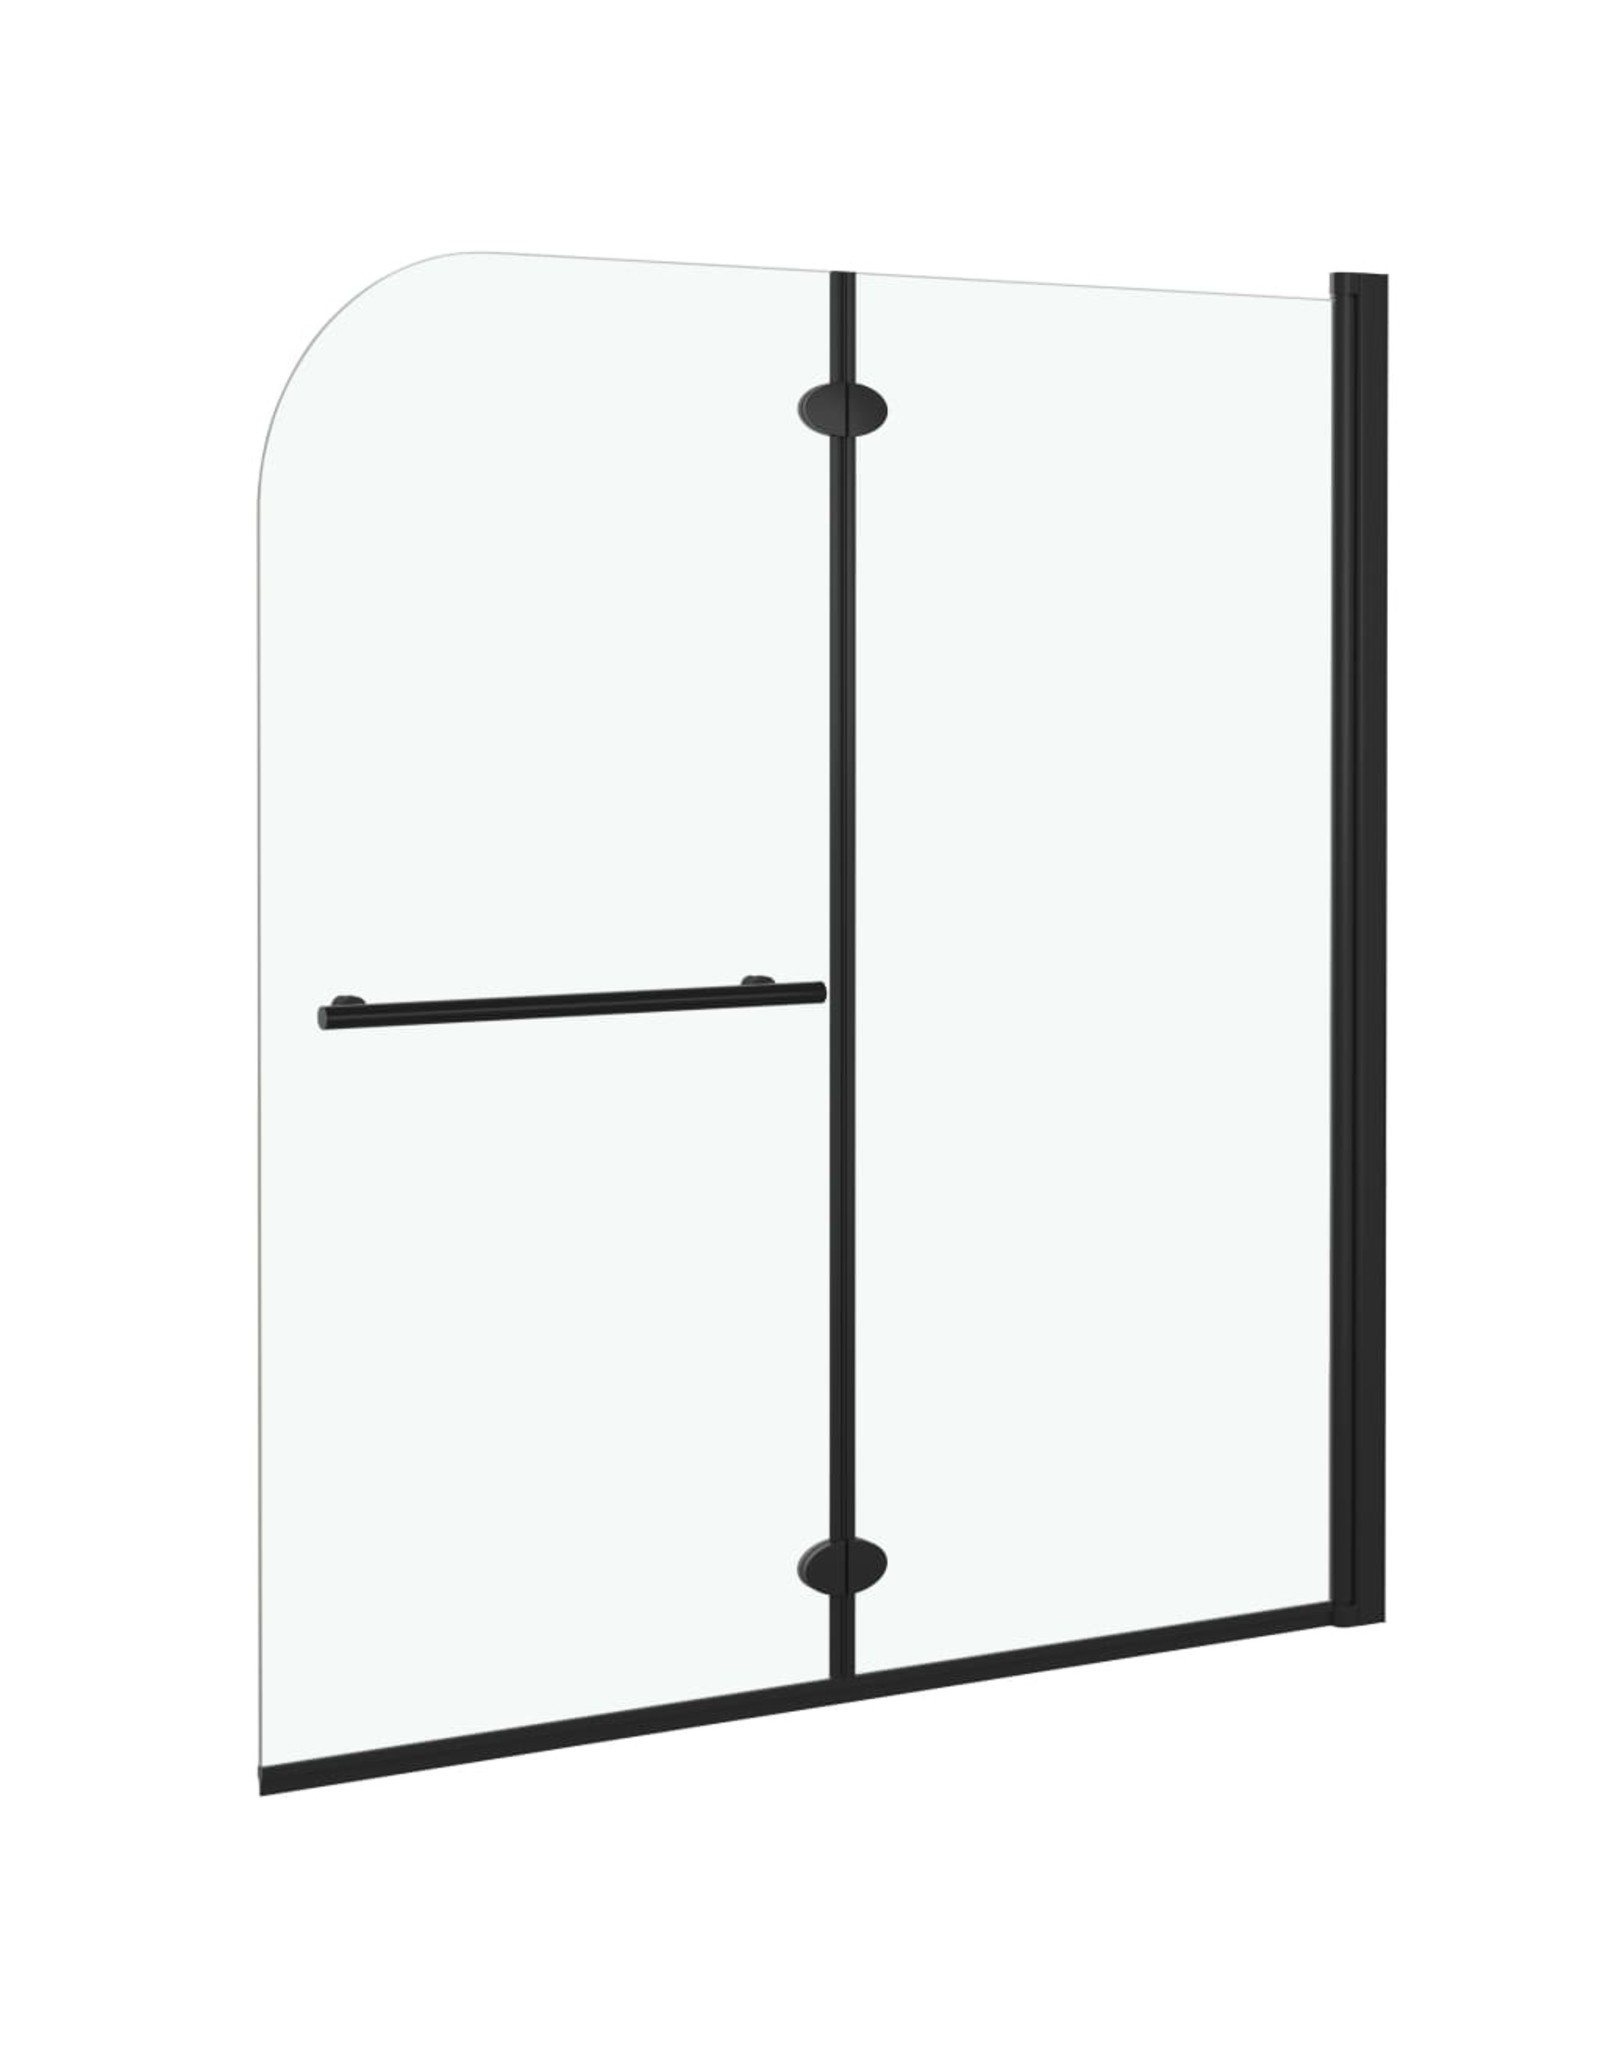 Douchewand inklapbaar 2 panelen 120x140 cm ESG zwart